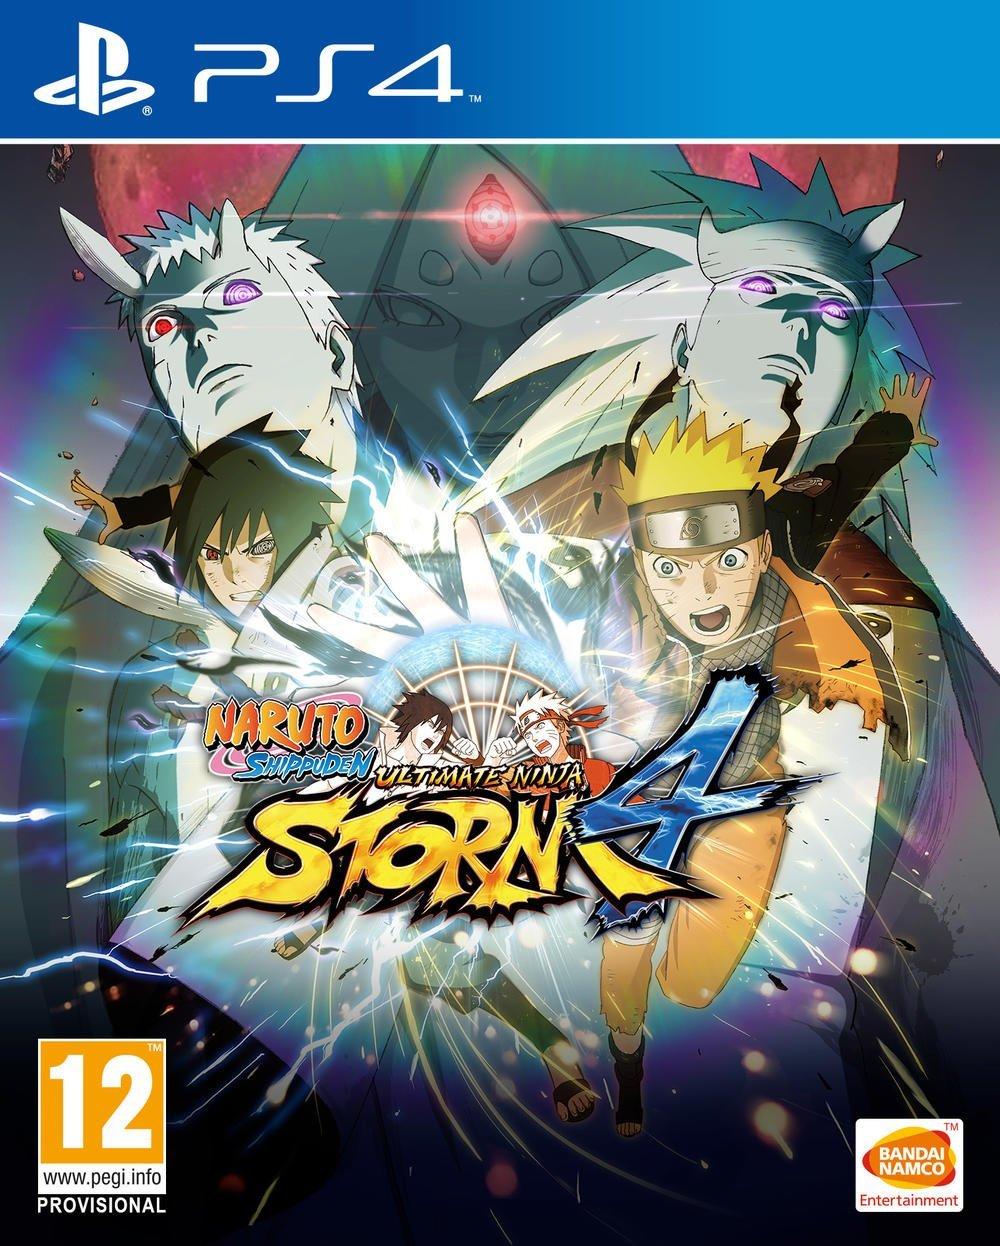 jaquette du jeu vidéo Naruto Shippūden: Ultimate Ninja Storm 4